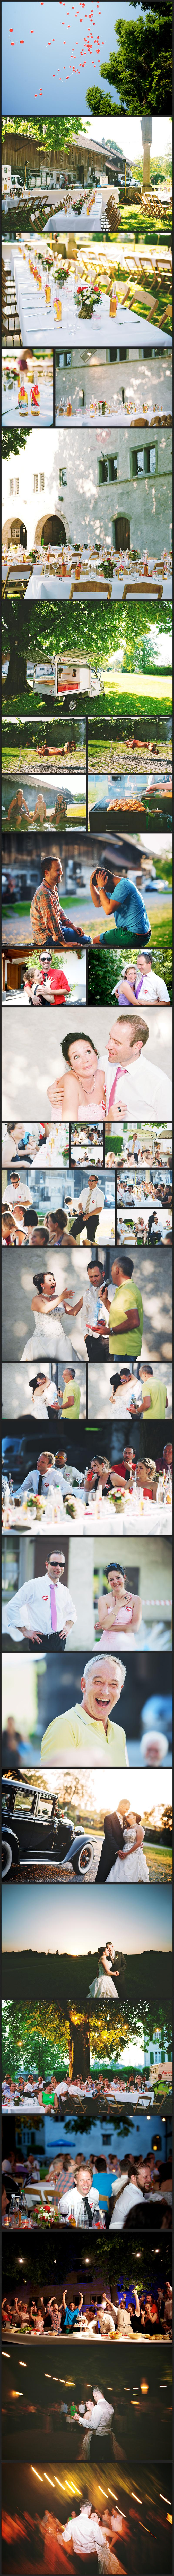 Blog-Collage-1377606681179